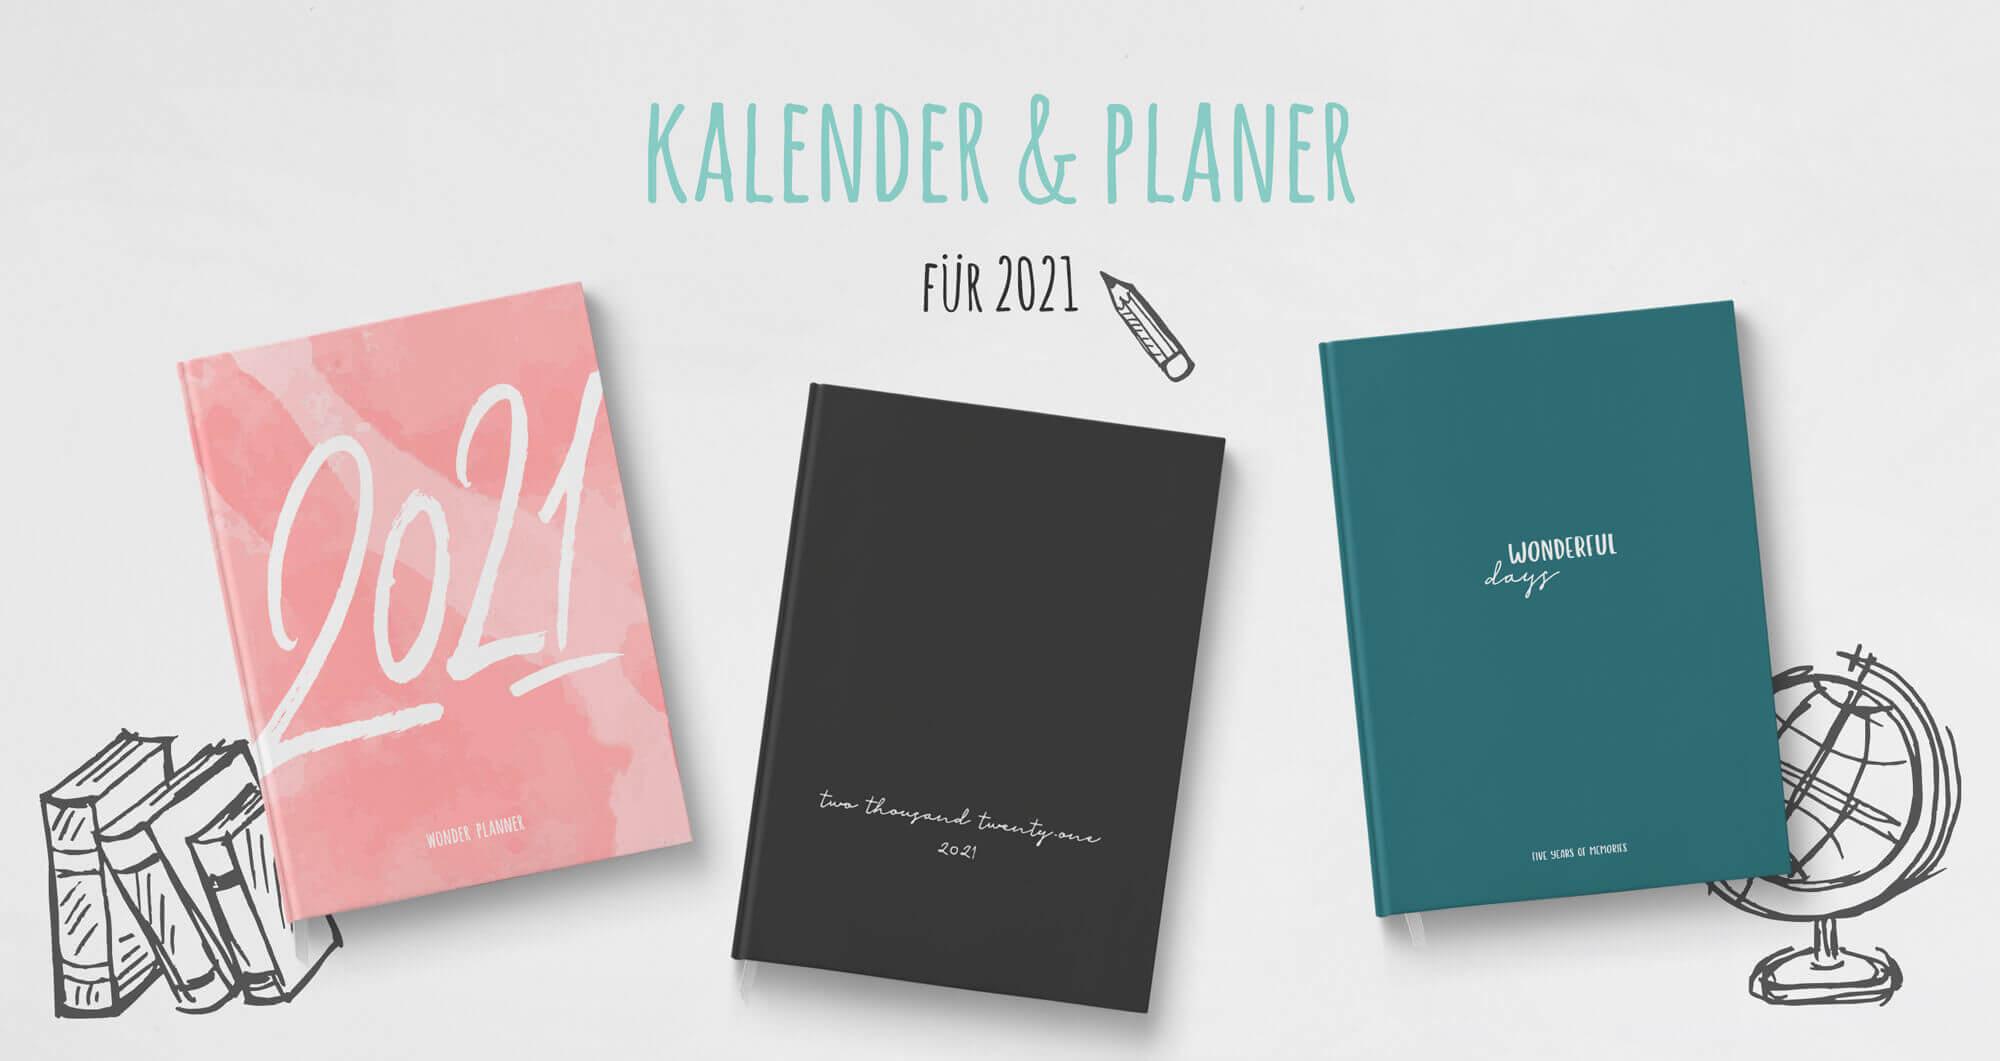 Kalender & Lebensplaner 2021 Wonderspot